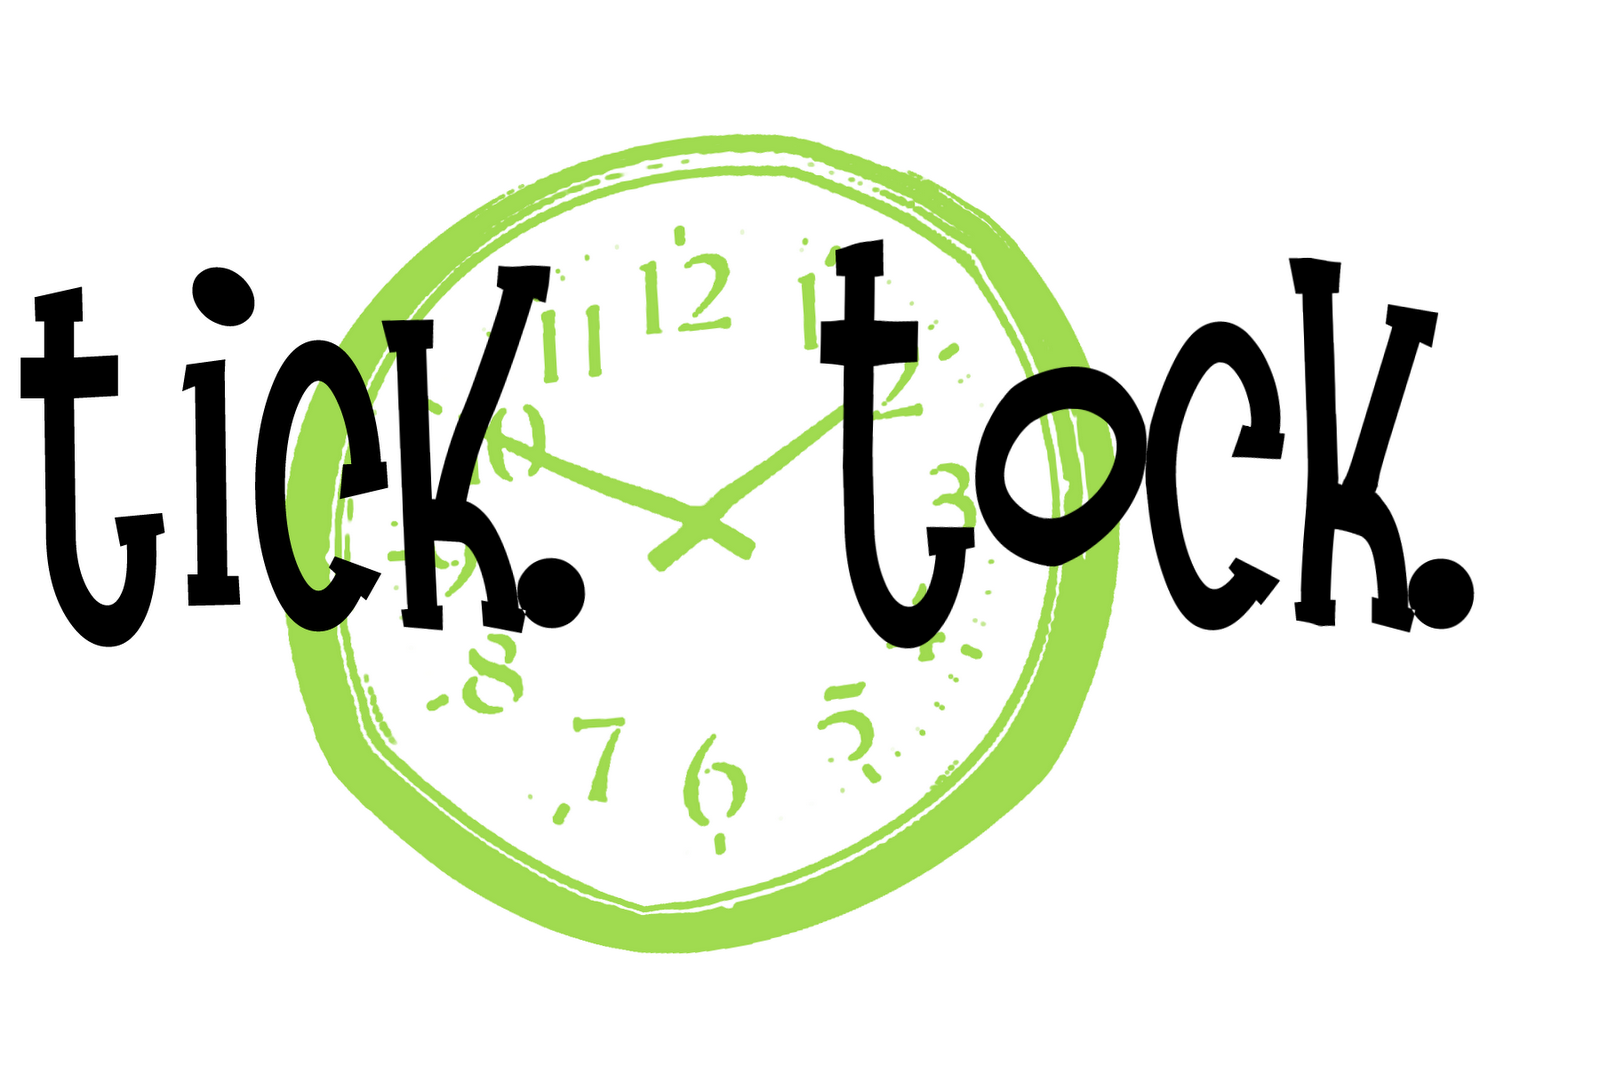 Tick tock clipart svg freeuse stock Green tick tick tock clock clipart clipartfest - ClipartBarn svg freeuse stock